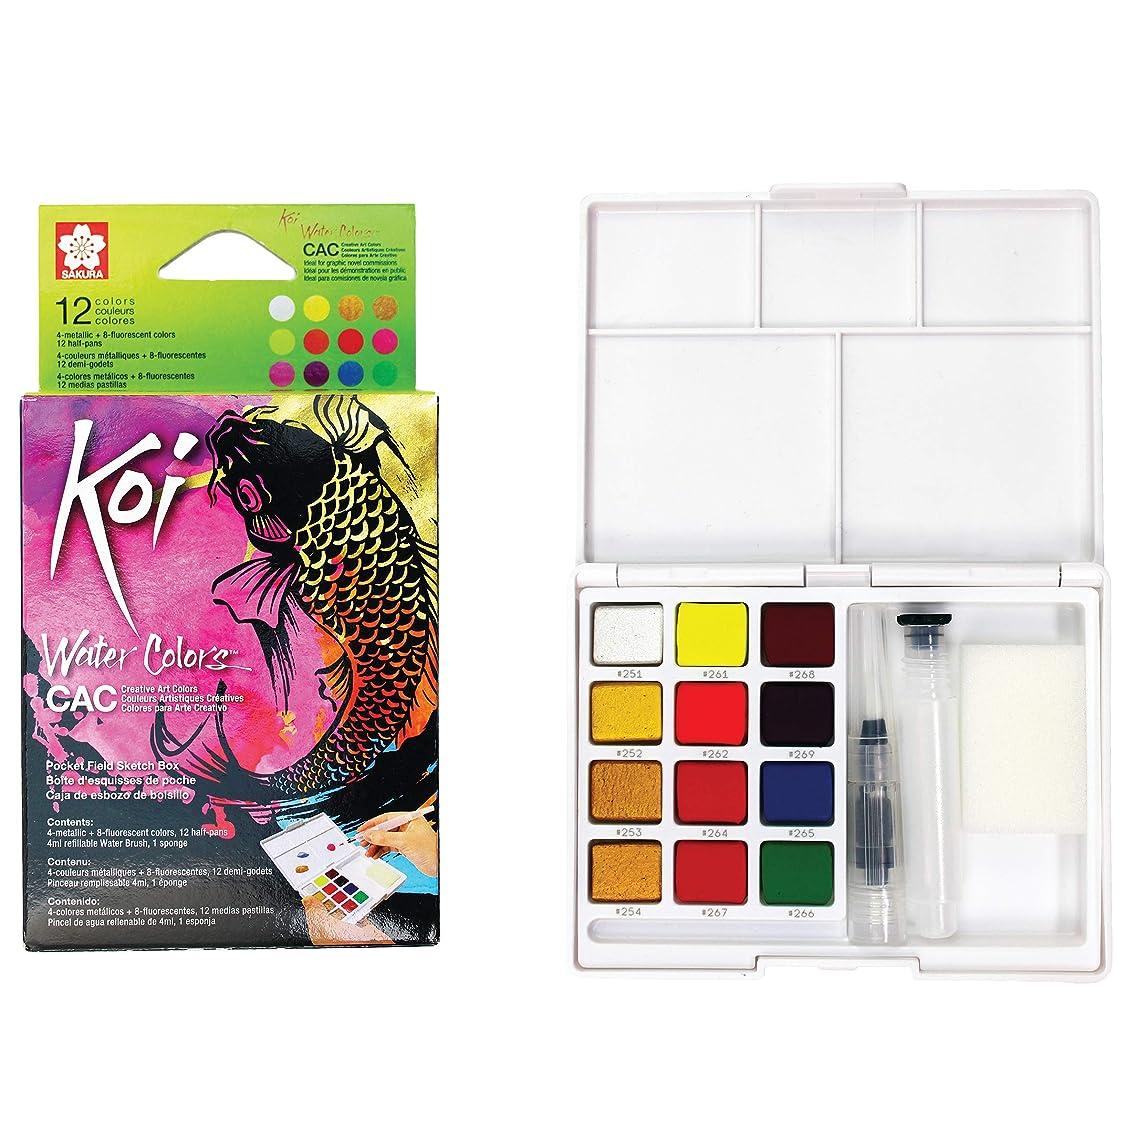 Sakura XNCW-12MH Koi Watercolor CAC Box 12 Color Field Sketch Set